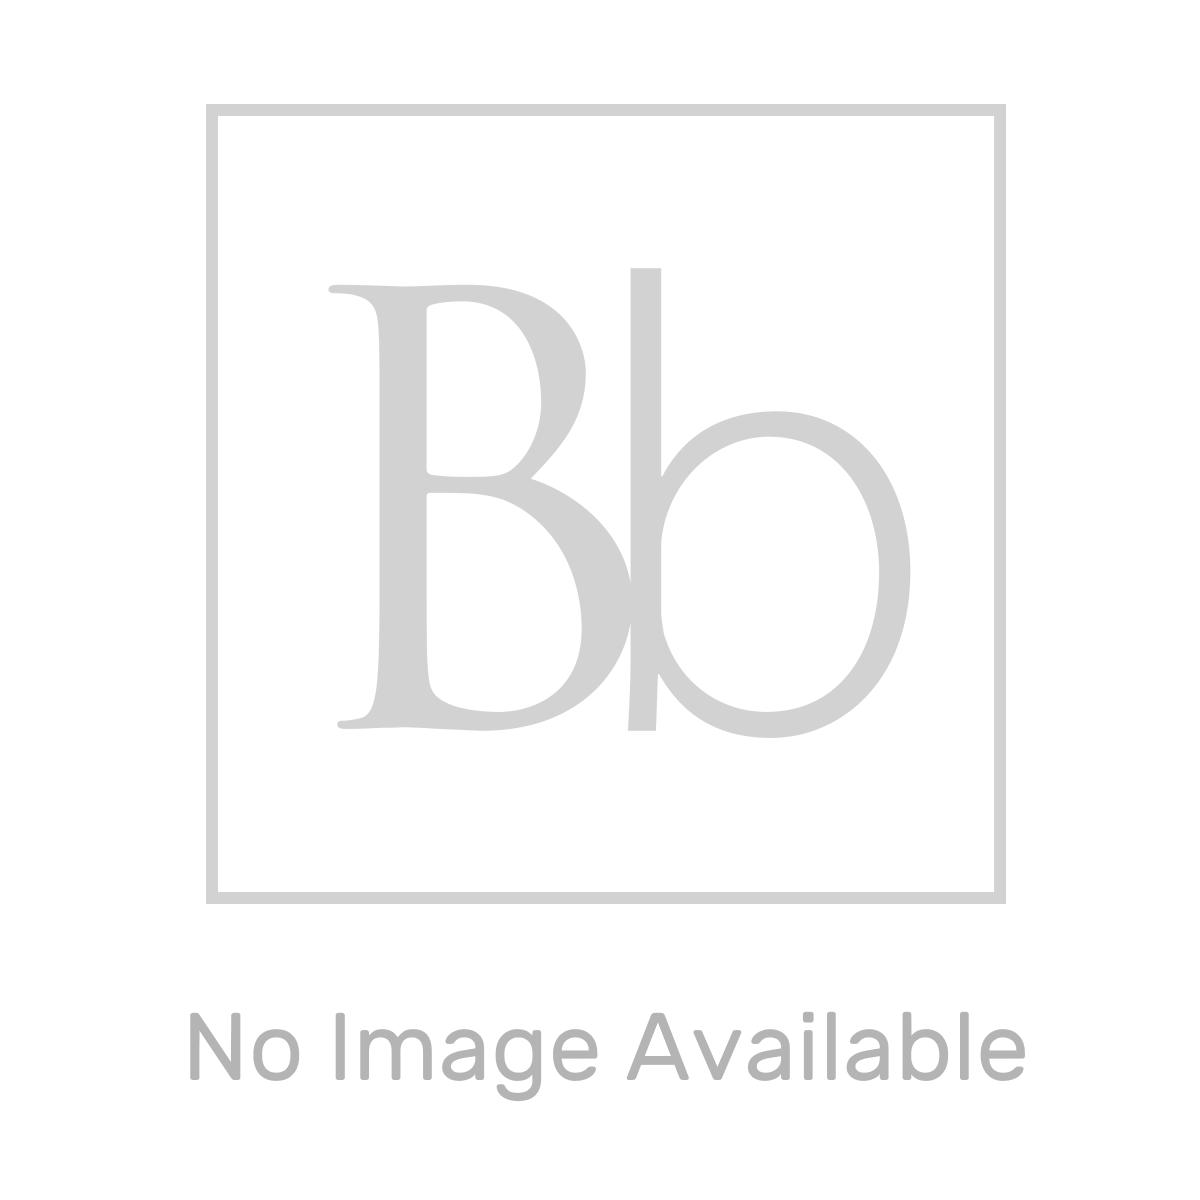 RAK Maremma Grey Matt Tile 600 x 600mm Lifestyle